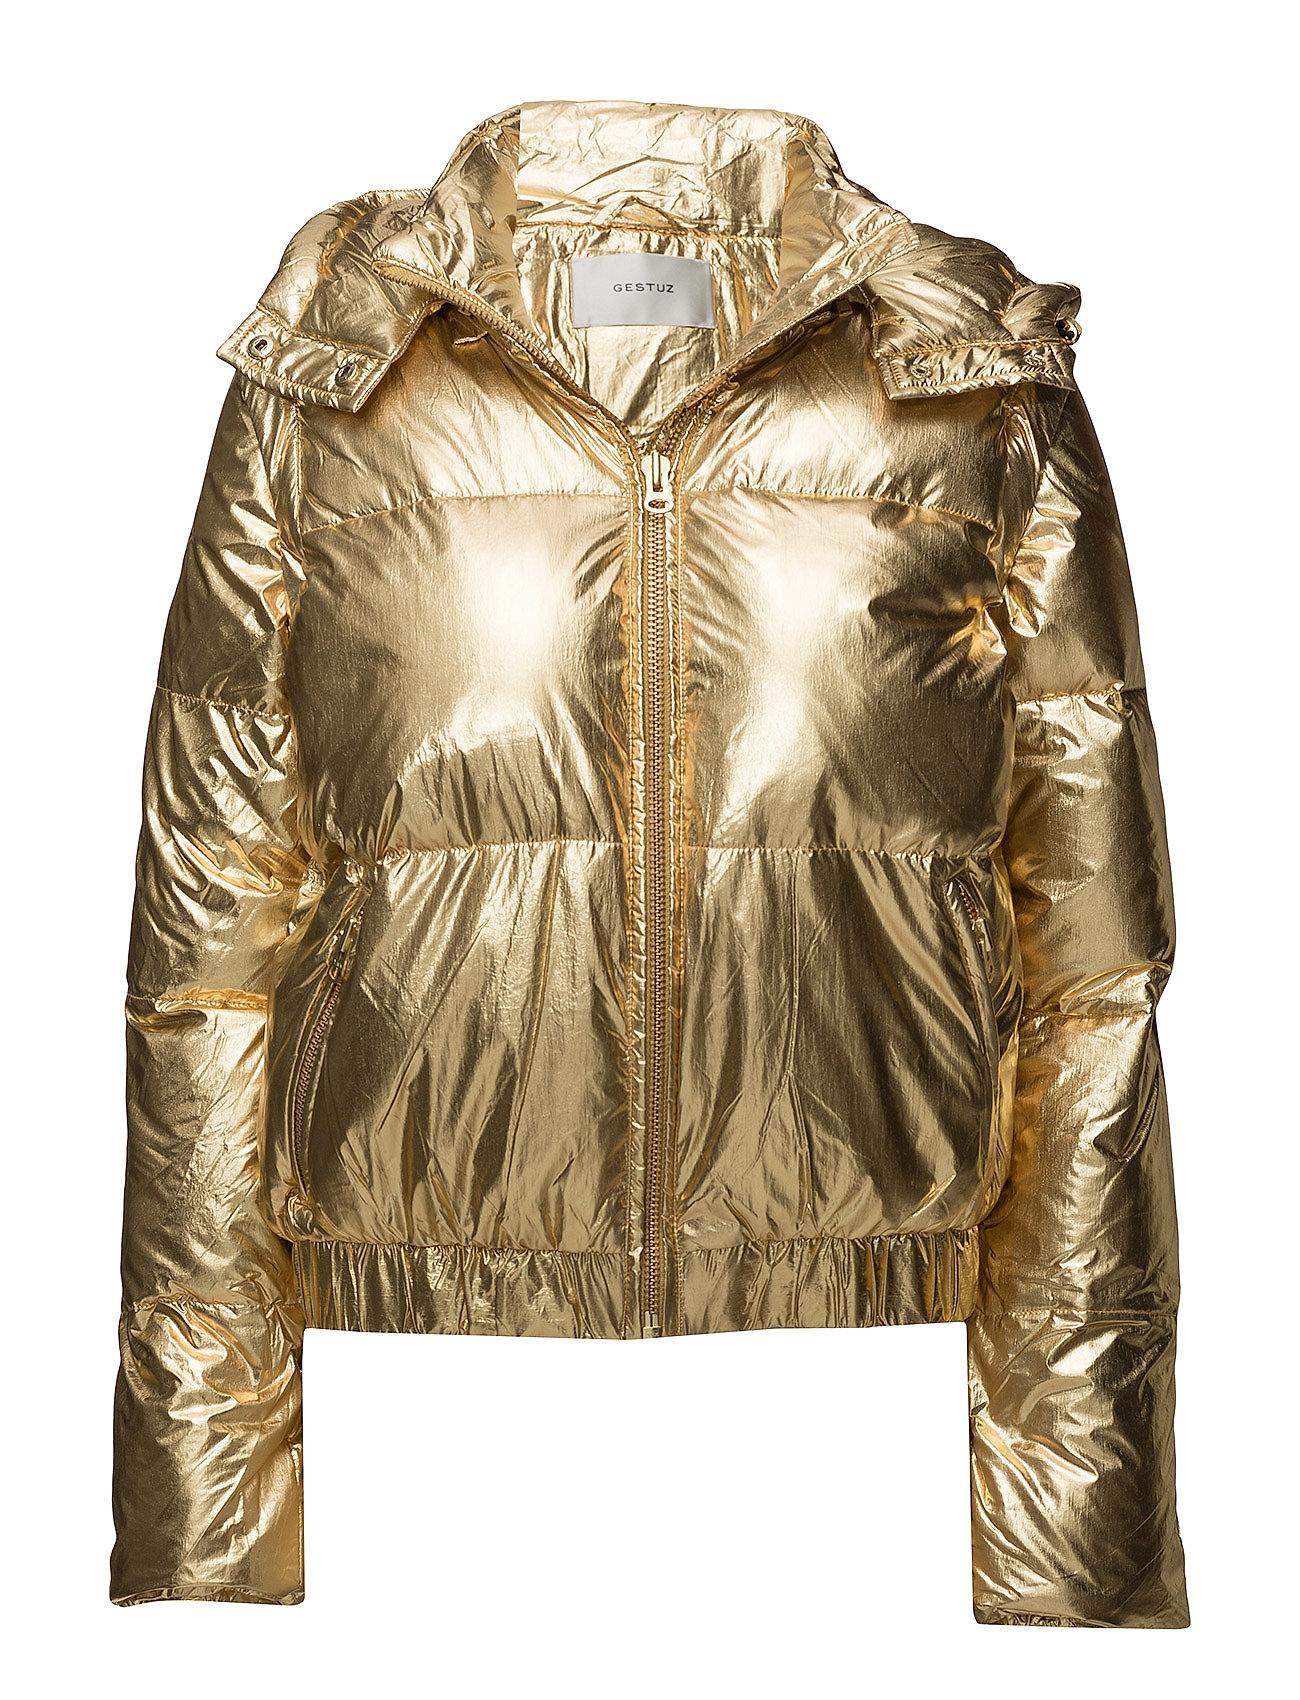 Gestuz Gold jacket YE2017